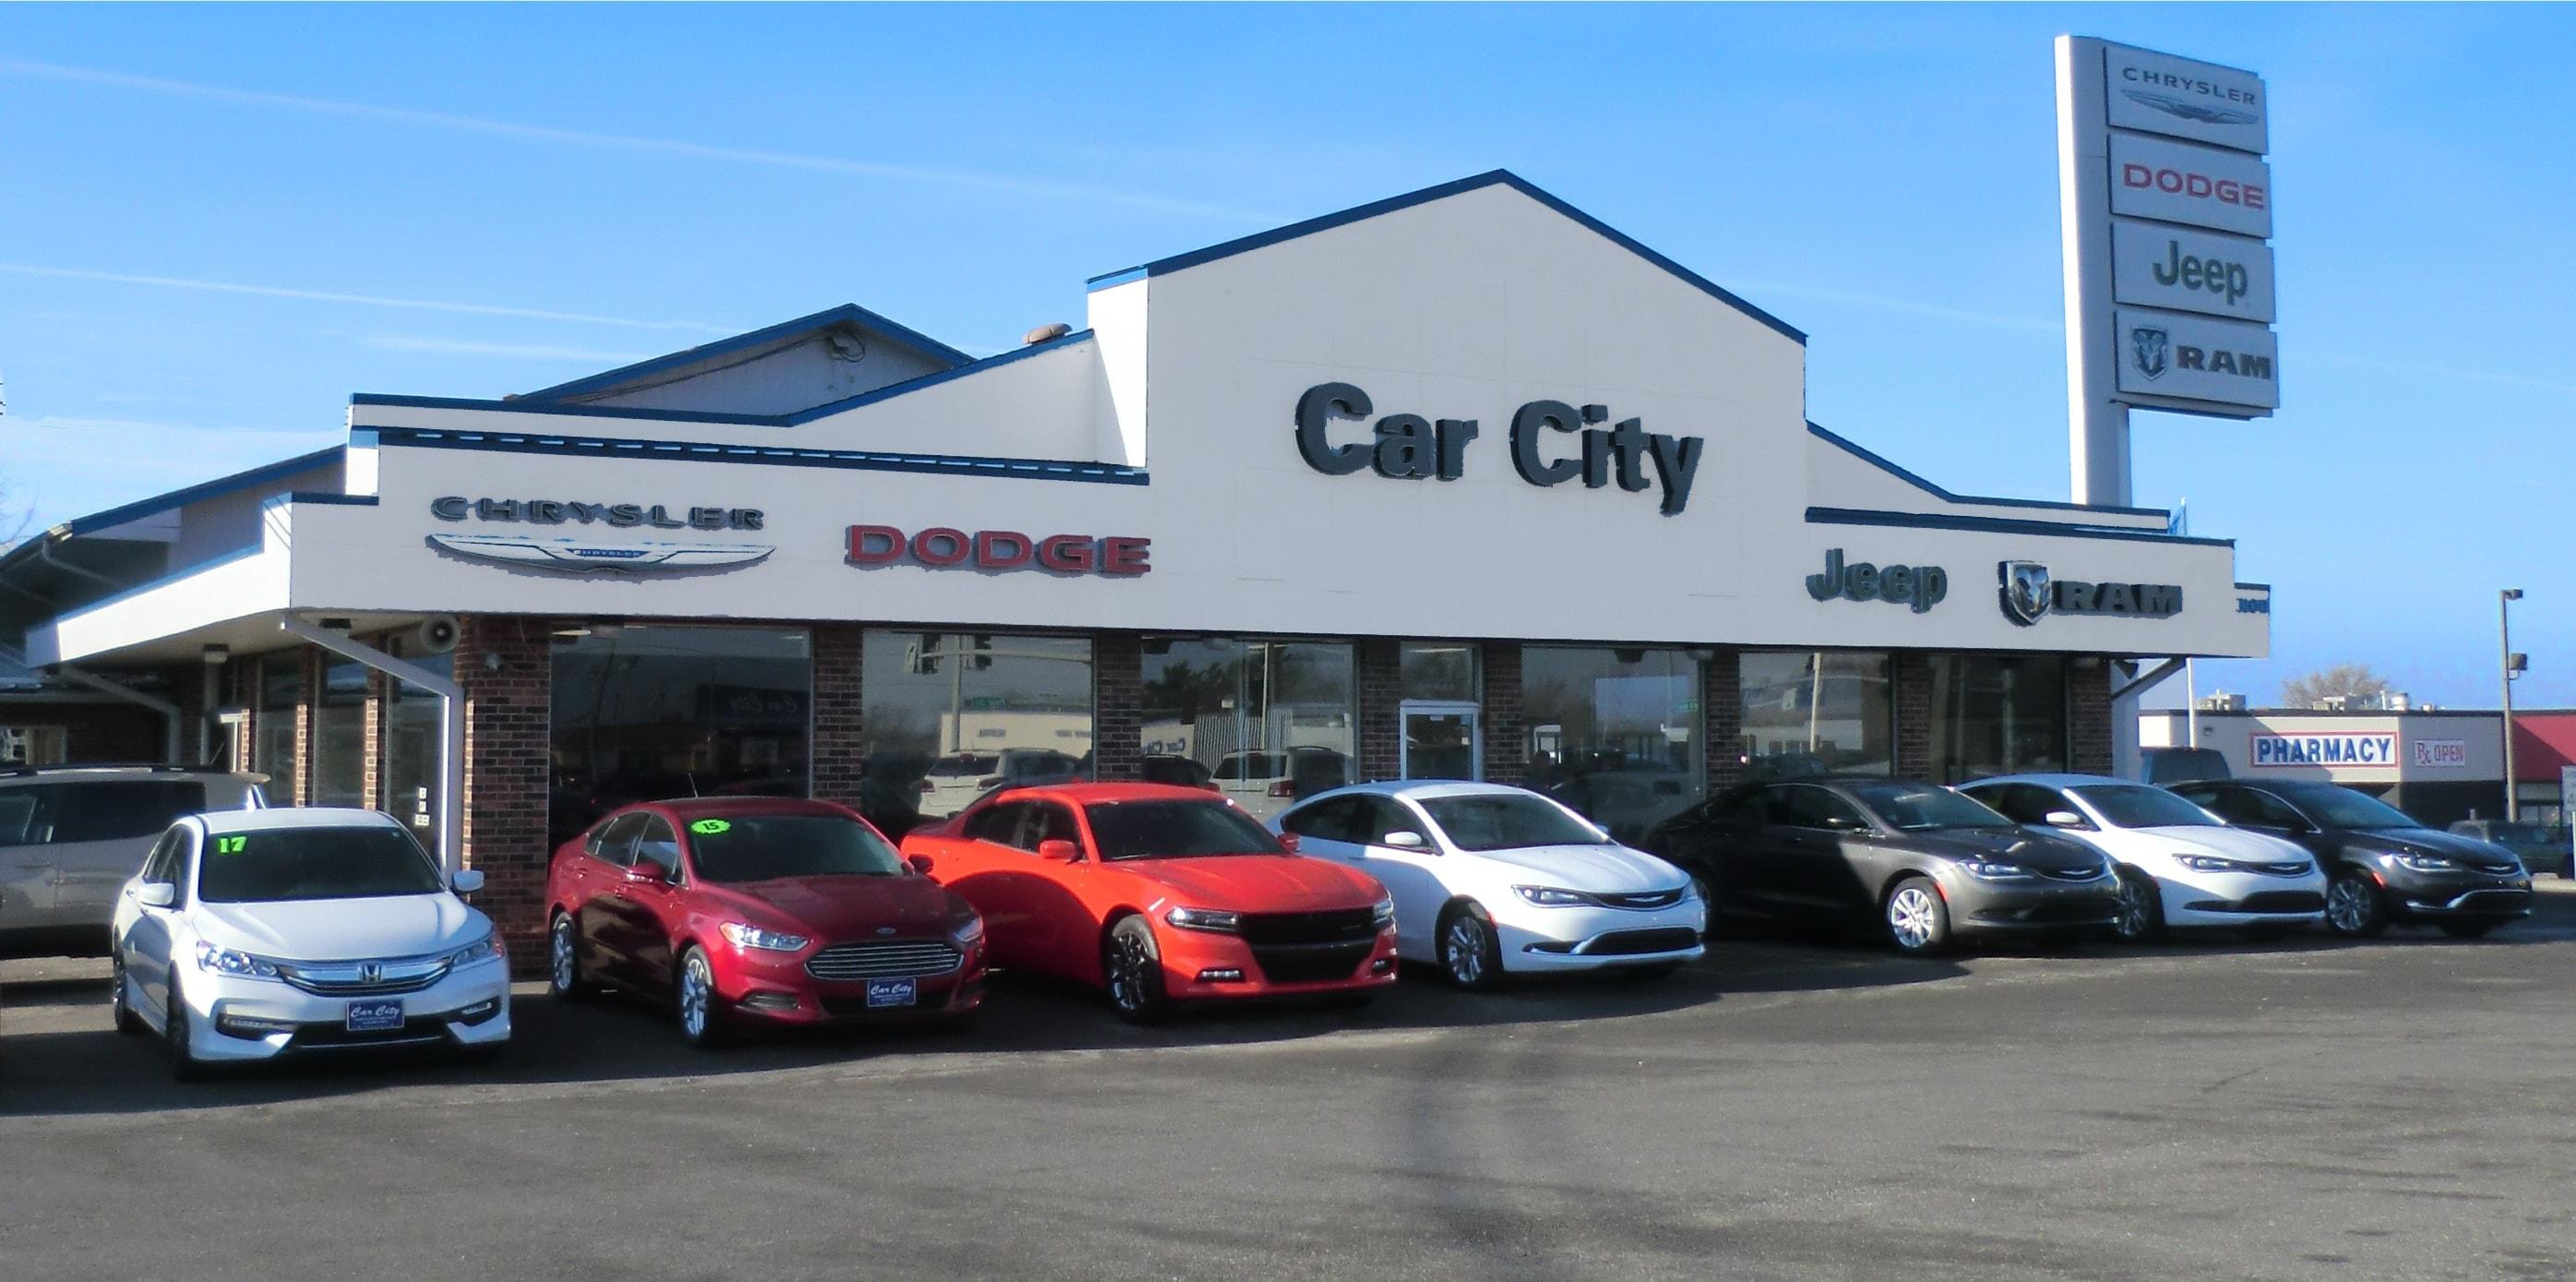 about car city chrysler dodge jeep ram new chrysler dodge jeep ram and used car dealer. Black Bedroom Furniture Sets. Home Design Ideas